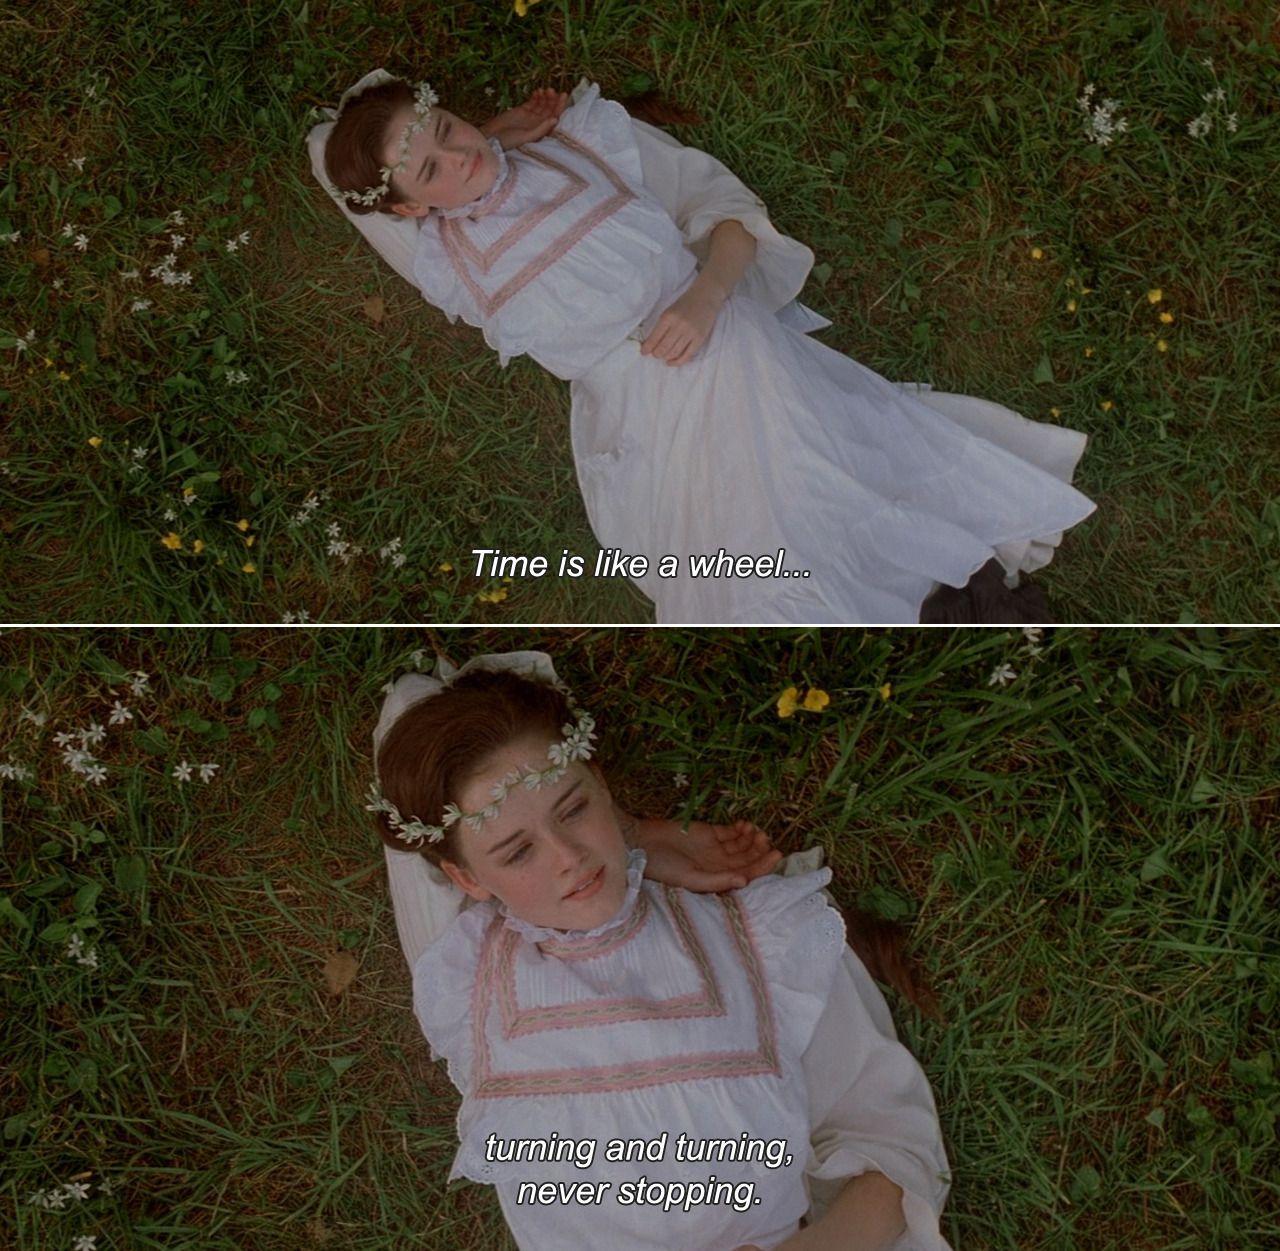 Tuck Everlasting (2002) Winnie Time is like a wheel